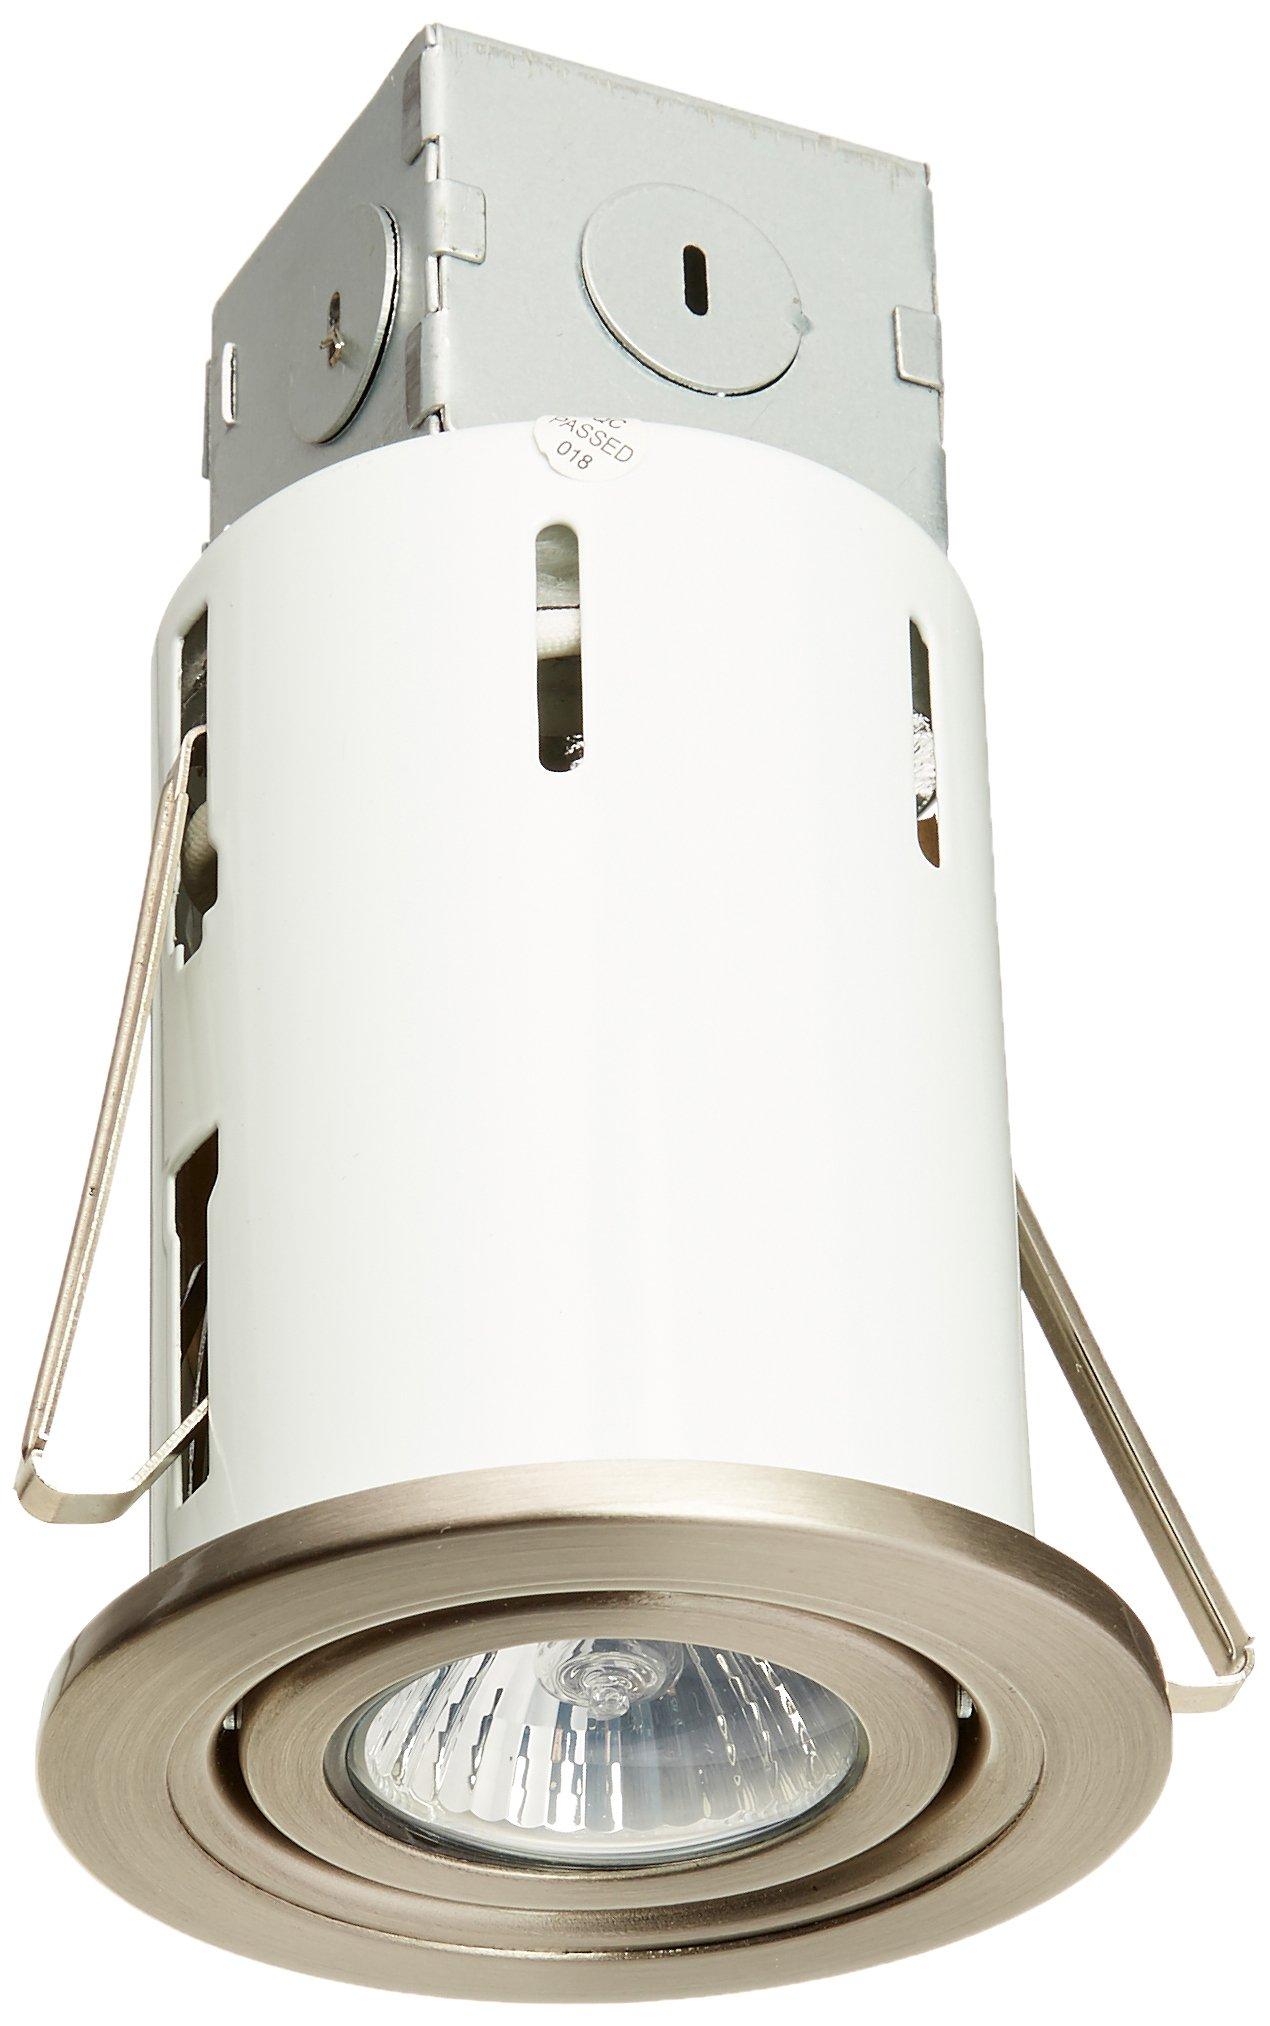 POWER ZONE RS6000R+ TRIM603- Recess Light GU10 Kit, 3-Inch, Brushed Nickel